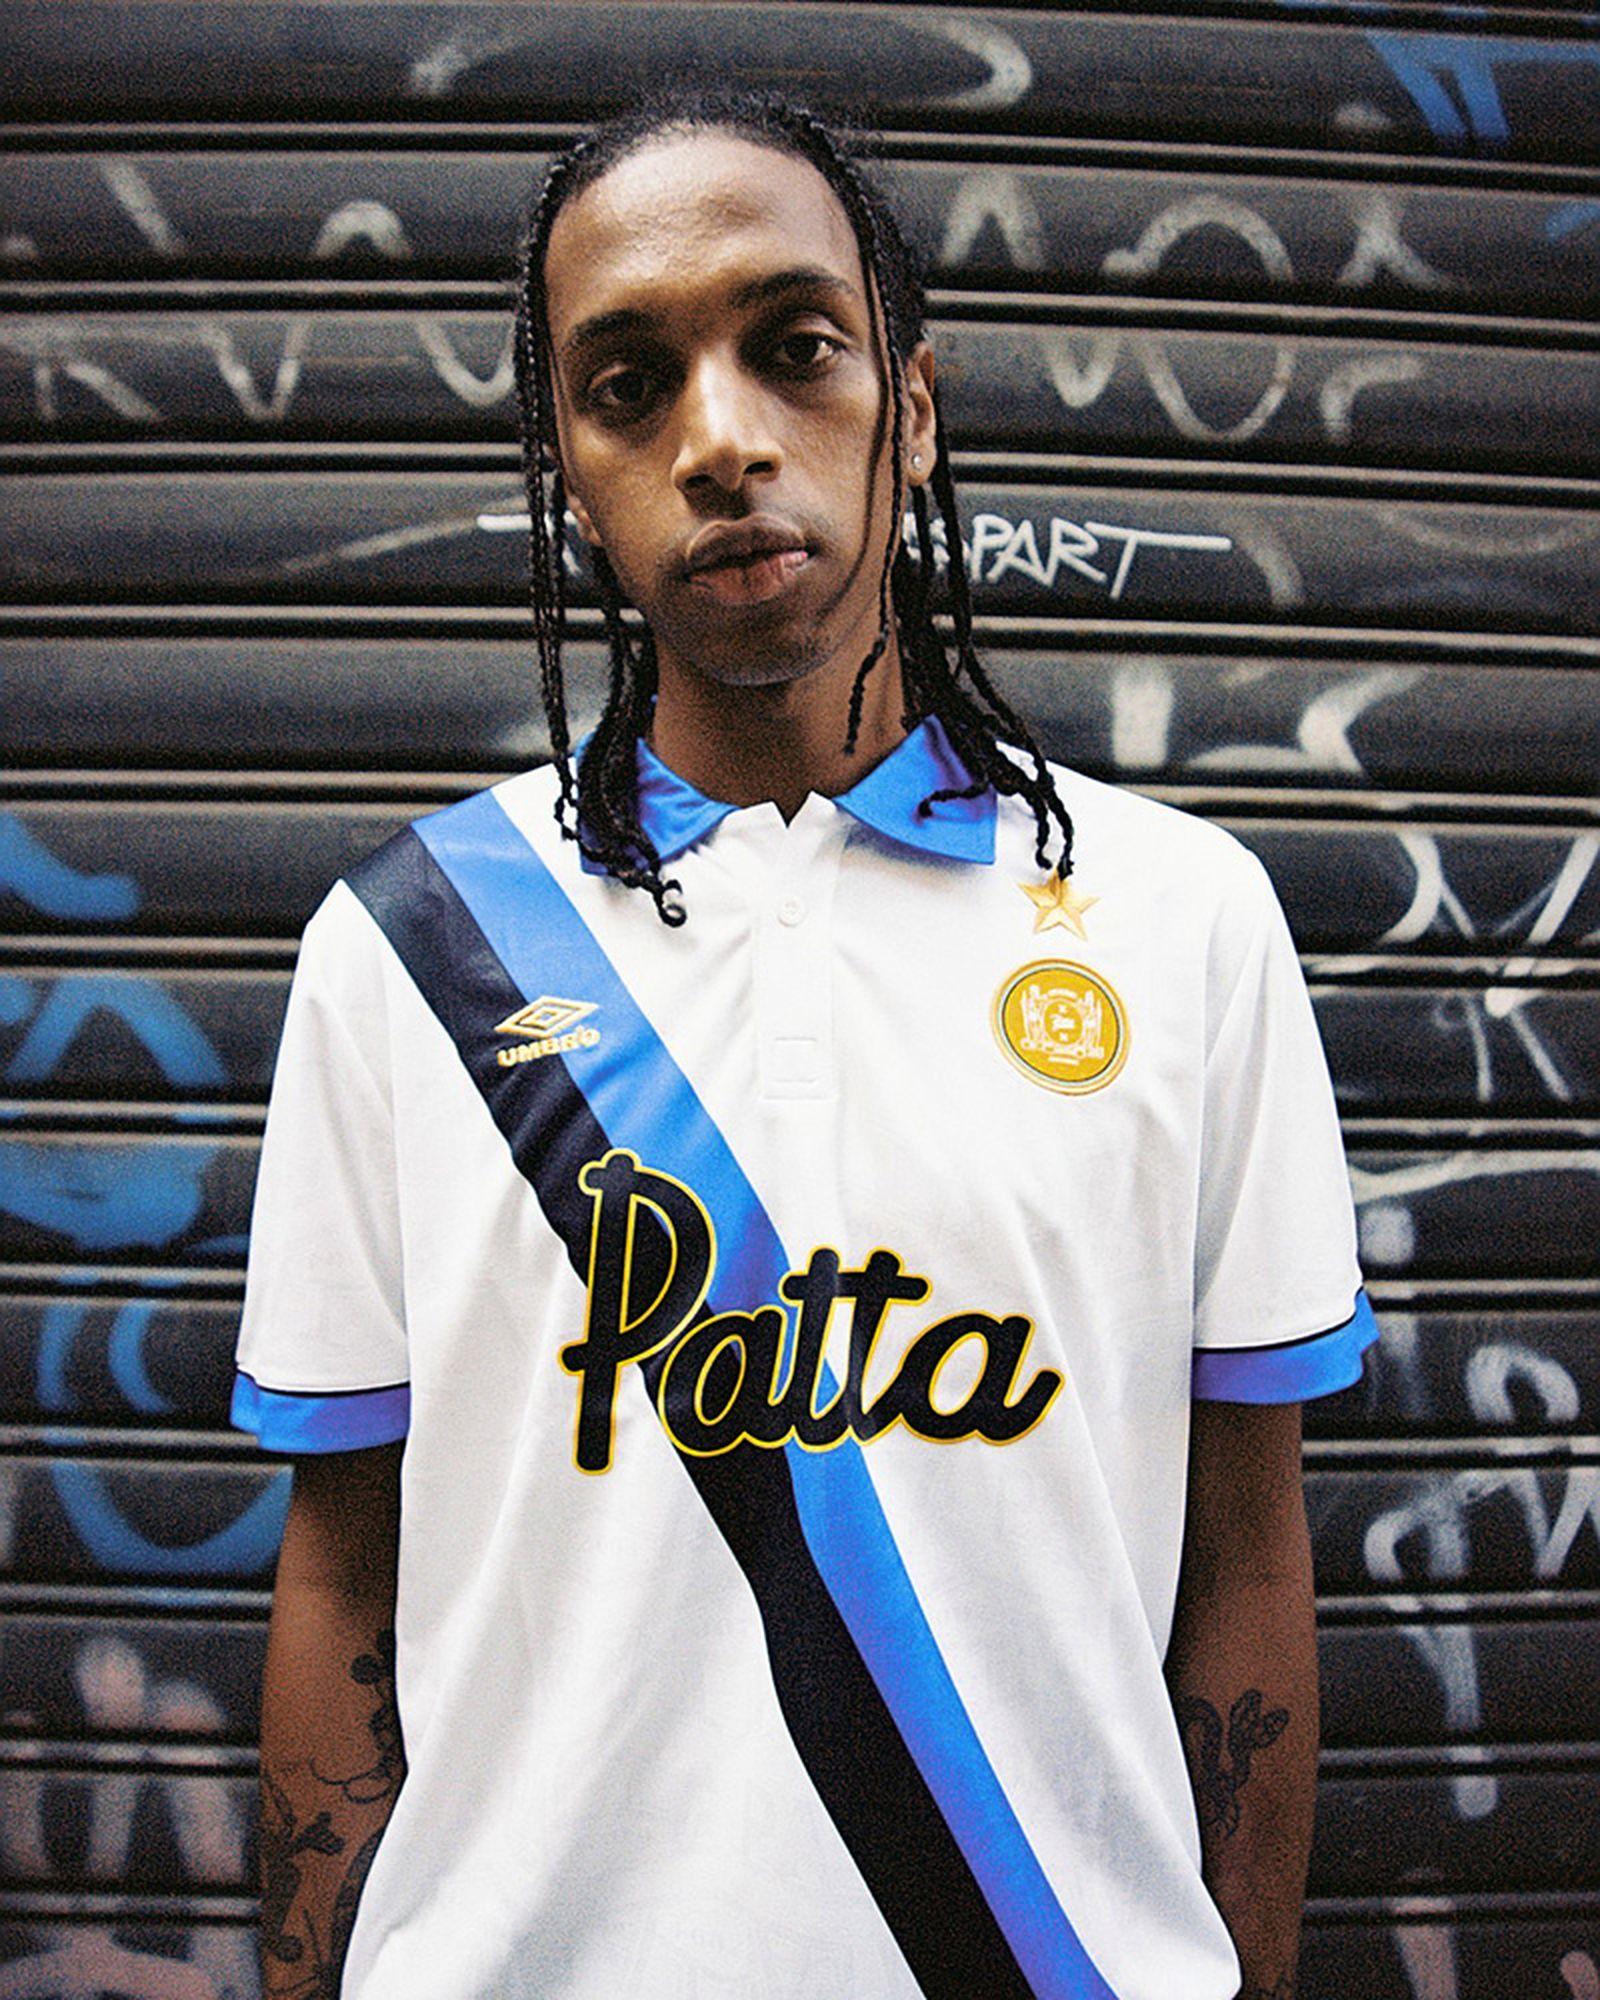 patta-umbro-inter-away-jersey-release-date-price-01